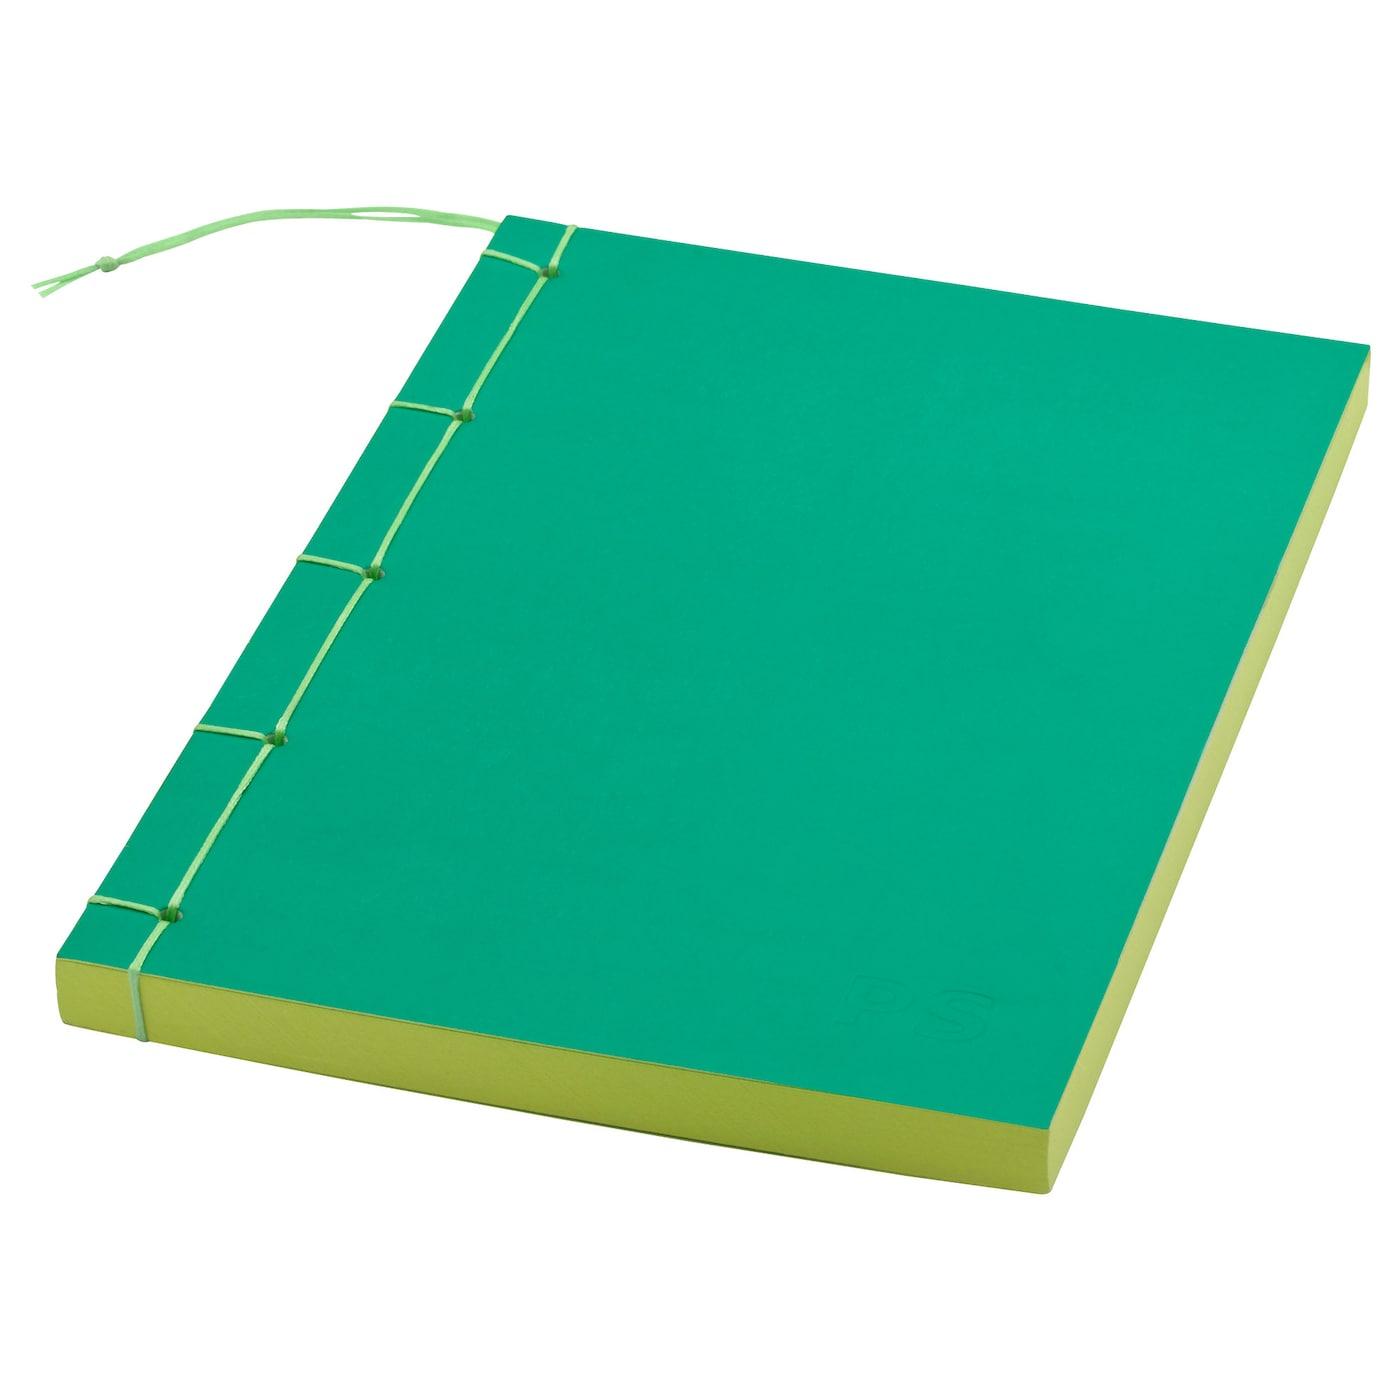 ikea ps 2017 note book green 14x21 cm ikea. Black Bedroom Furniture Sets. Home Design Ideas